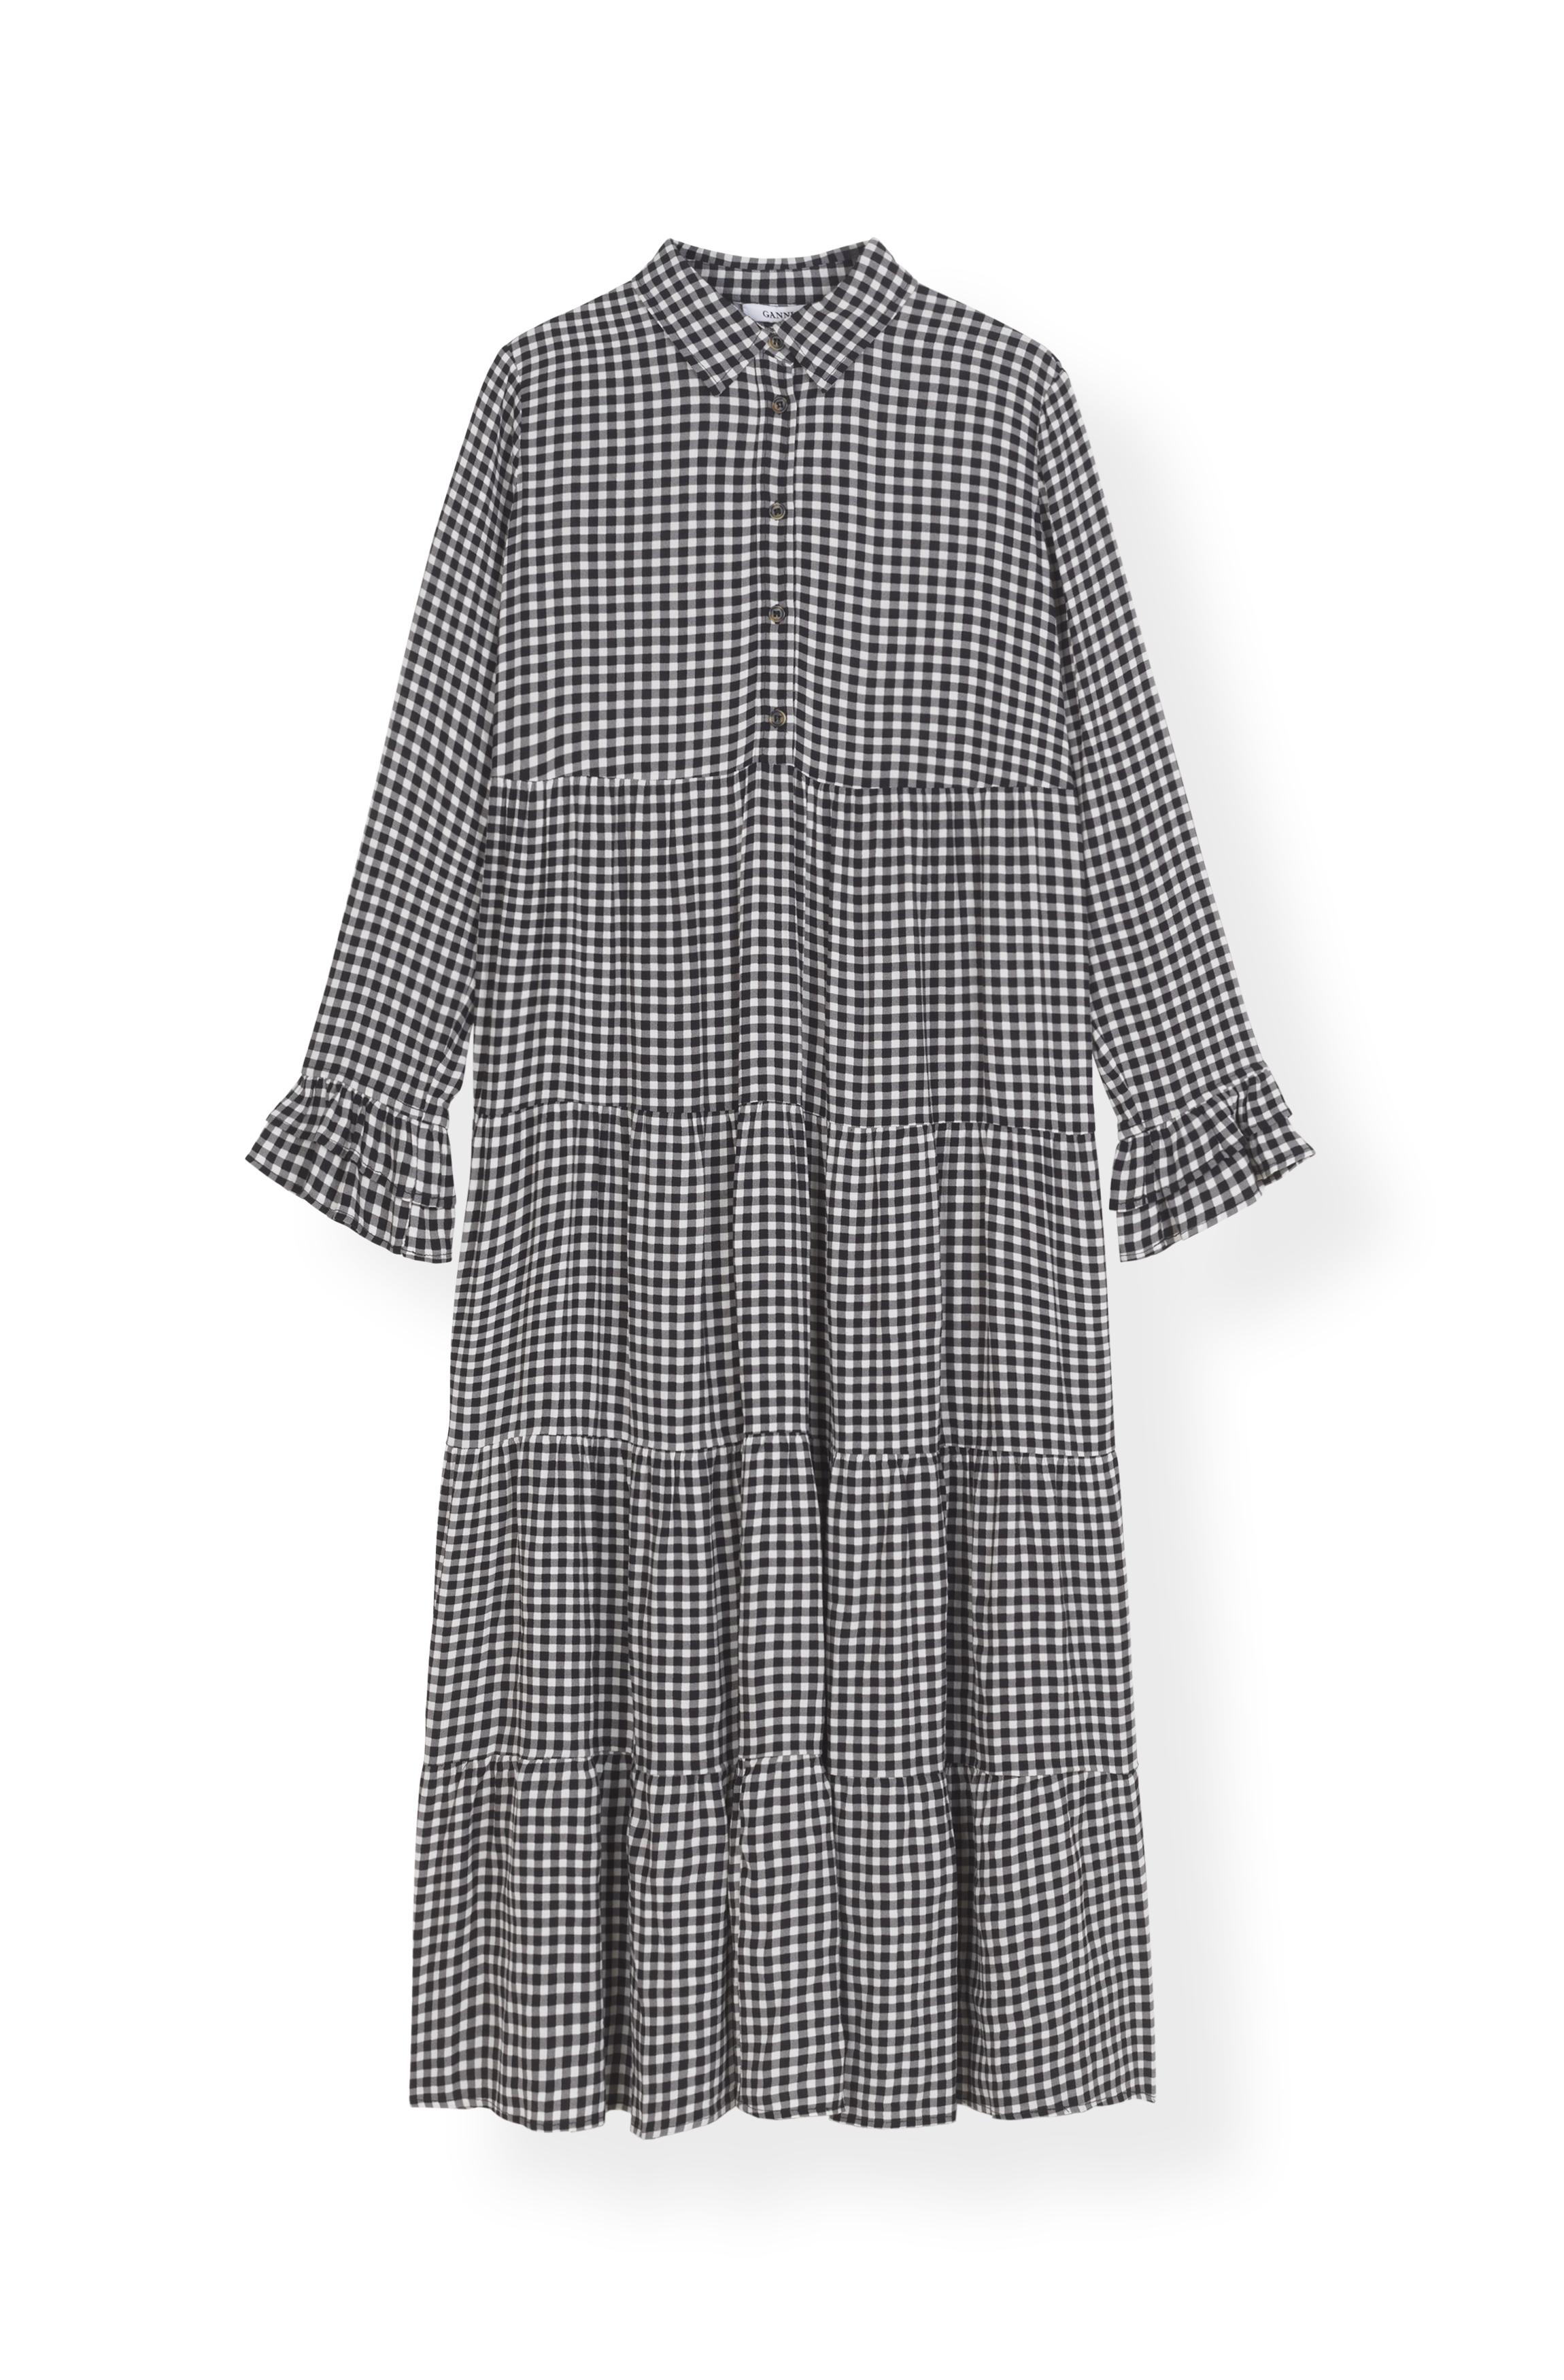 Image of   Ganni F3390 Layer Dress Printed Crepe, 099 Black